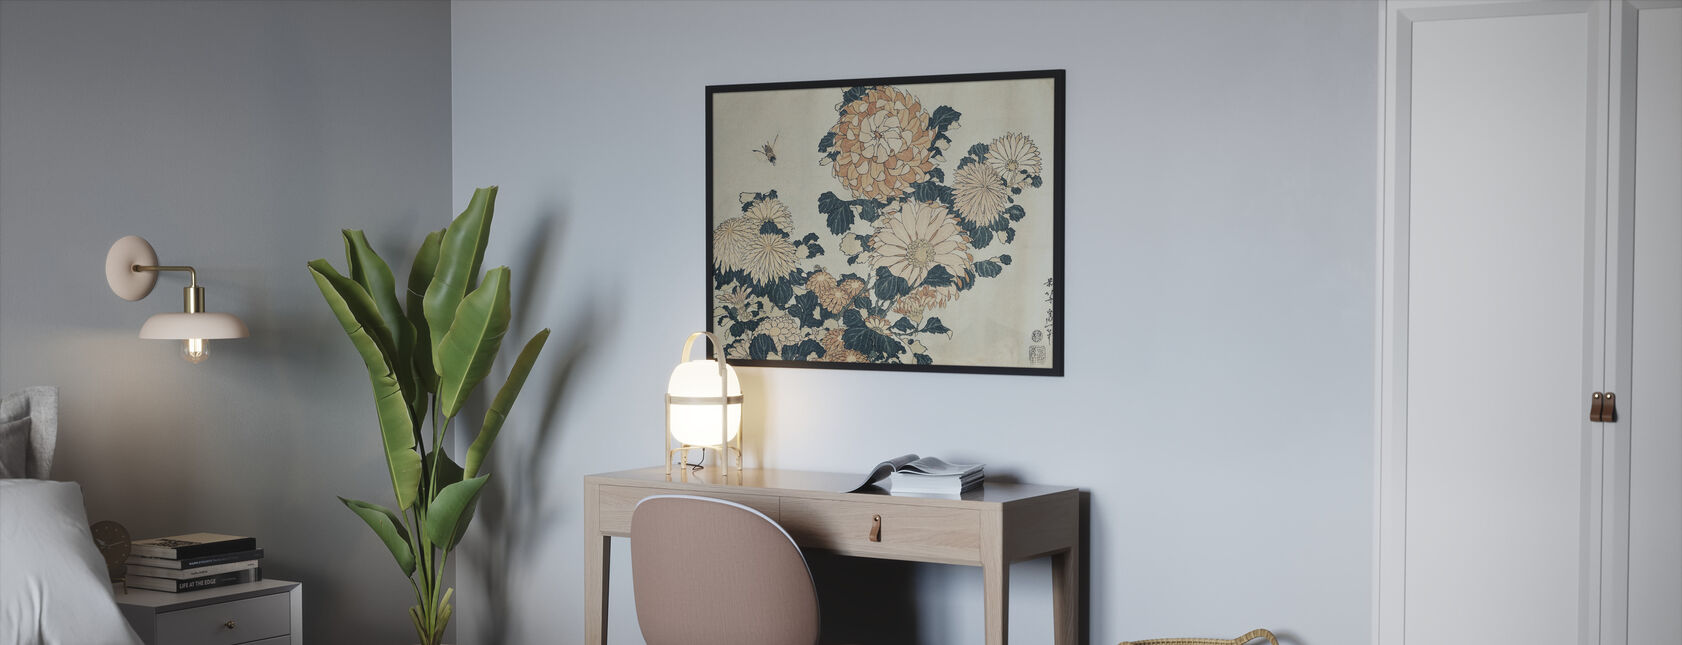 Chrysanthemums, Katsushika Hokusai - Framed print - Bedroom